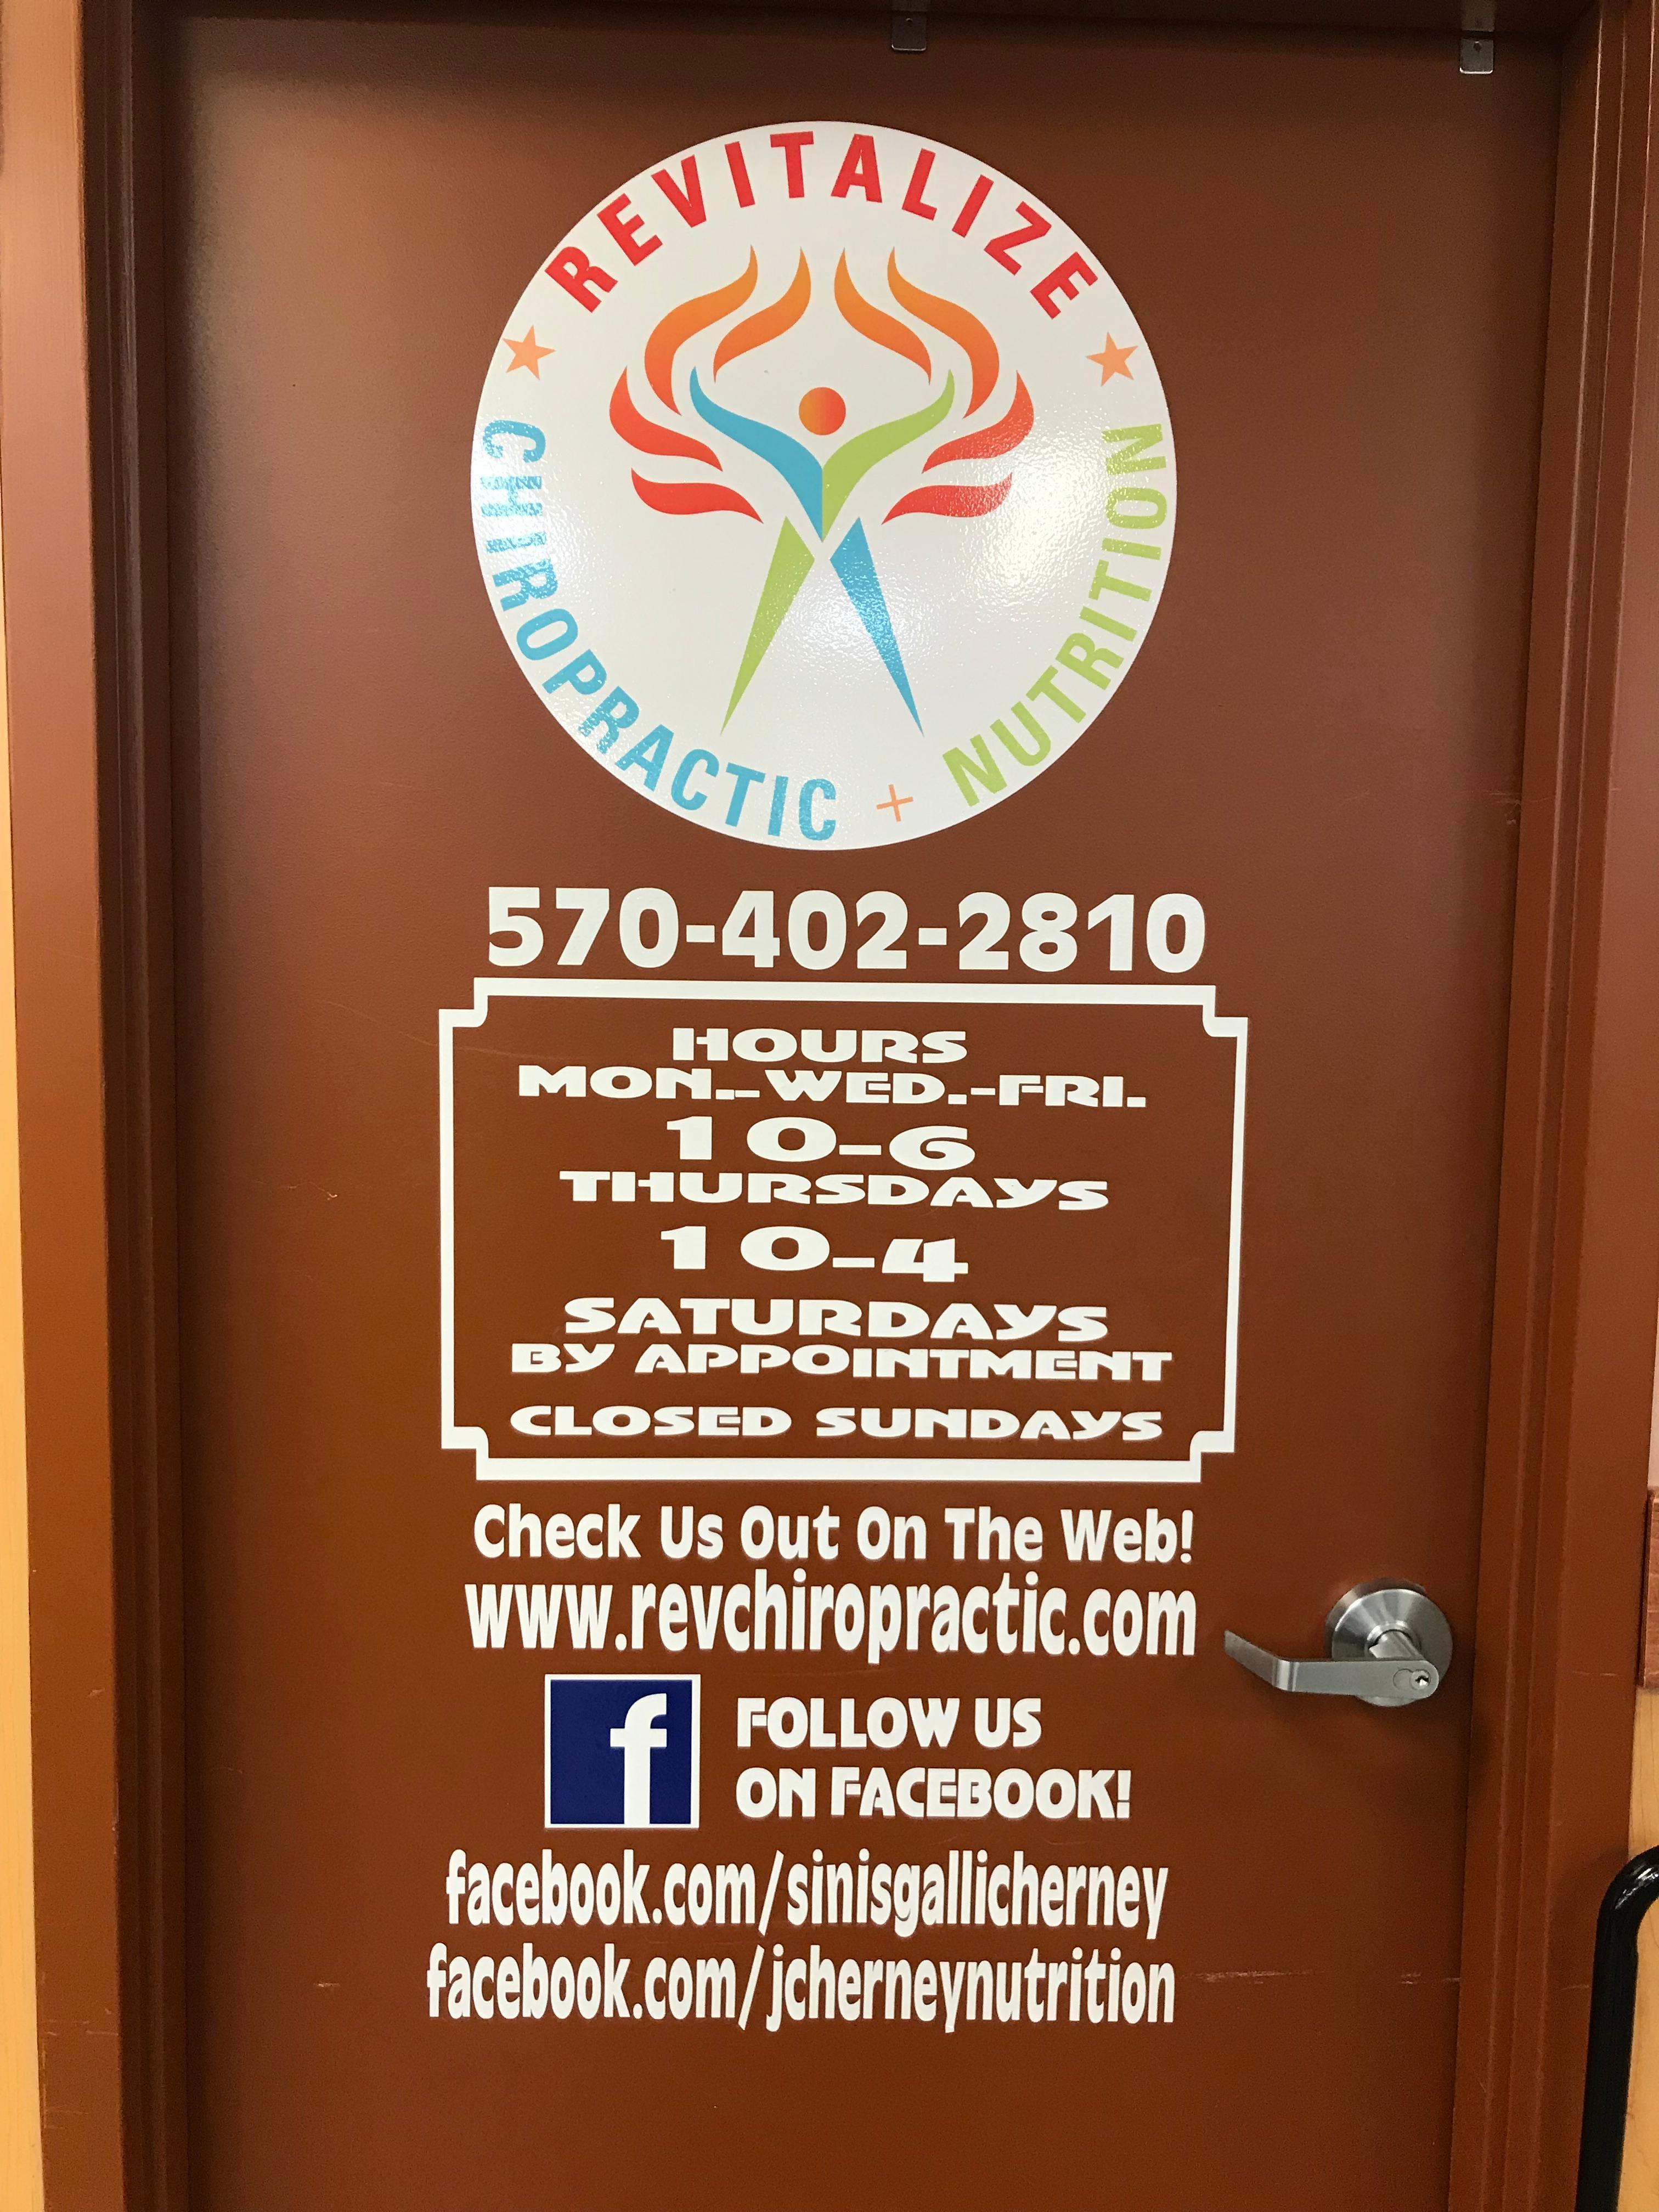 Revitalize Chiropractic Wellness Center image 6